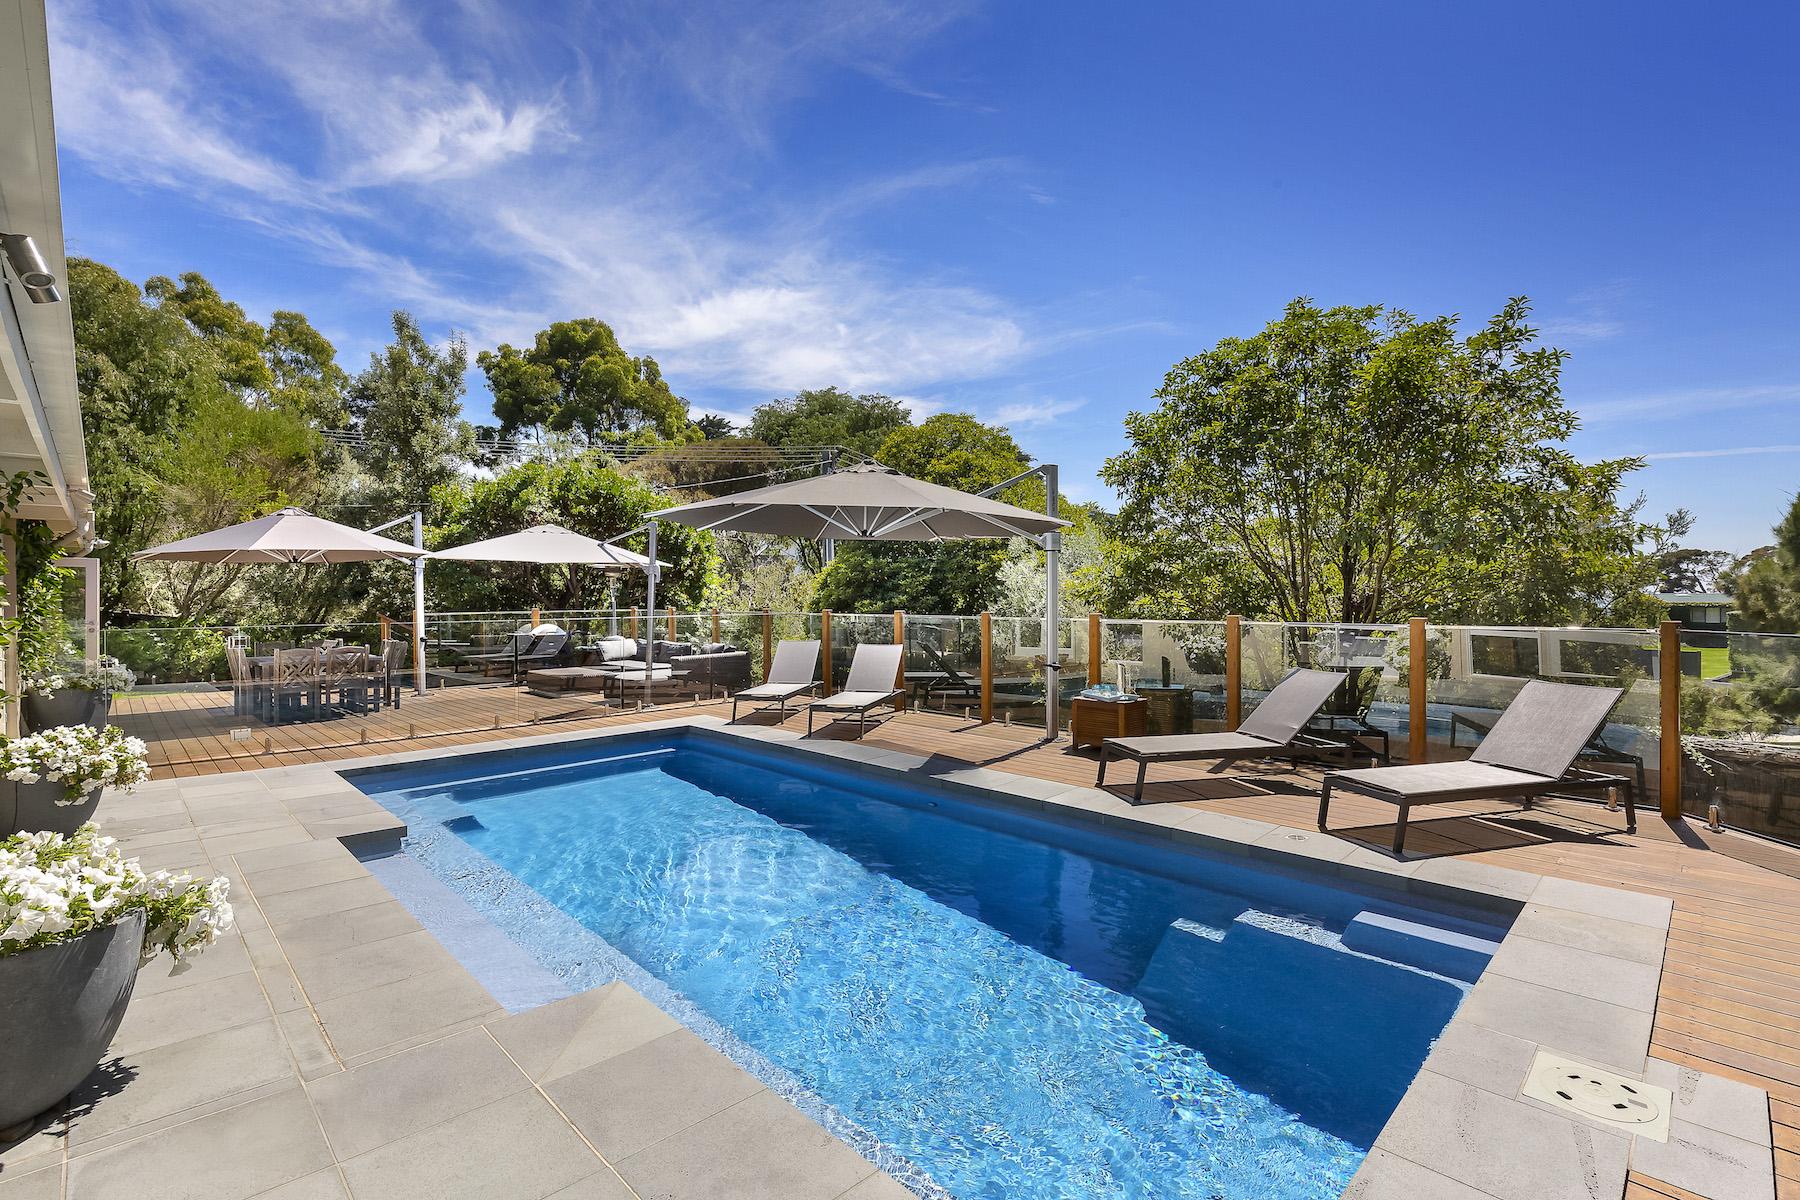 Casa Unifamiliar por un Venta en 3538 Point Nepean Road, Portsea Melbourne, Victoria, 3943 Australia